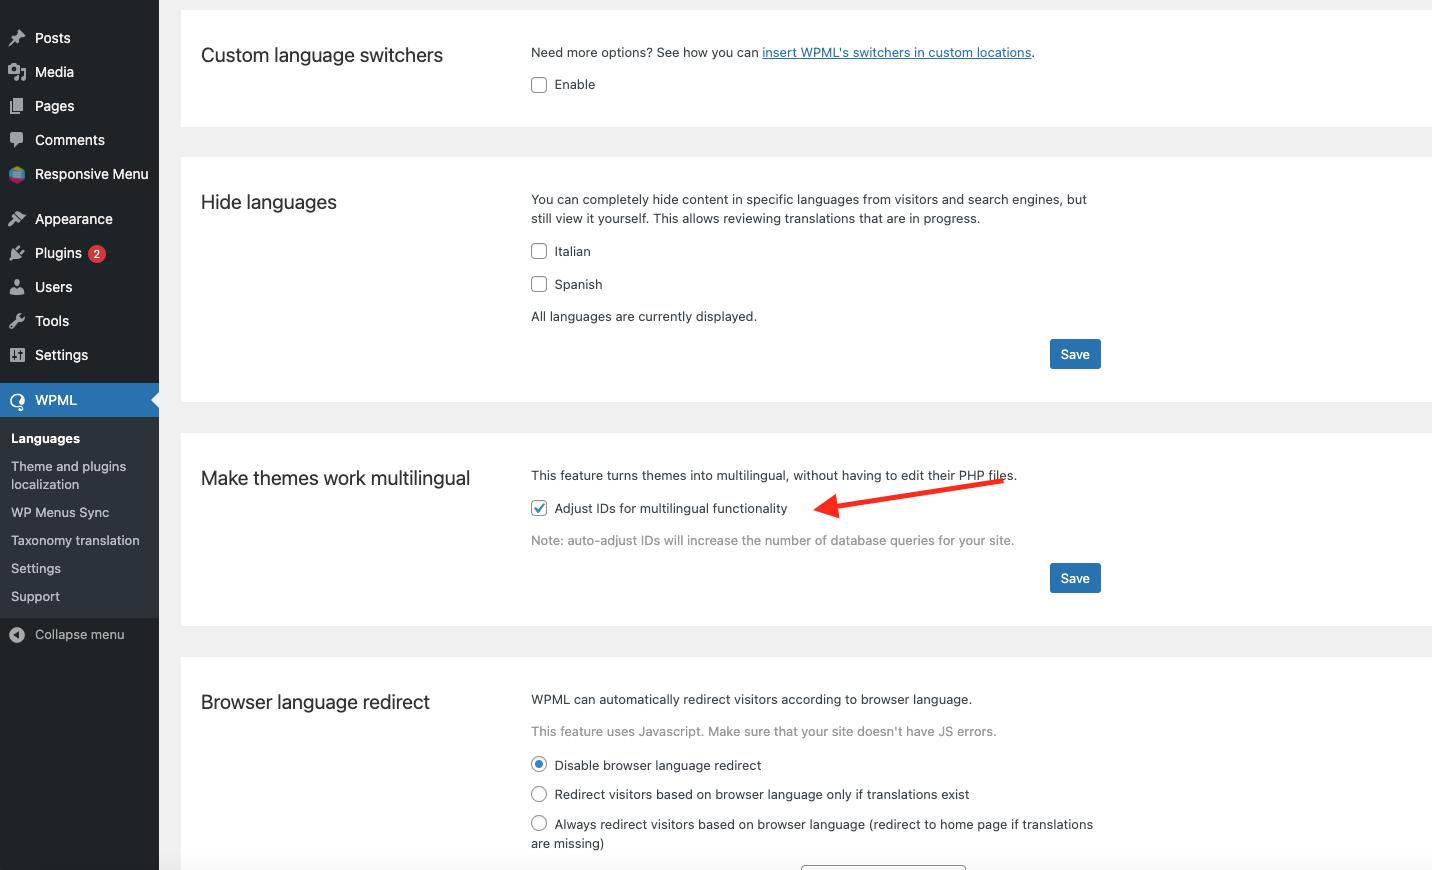 Integrate Responsive Menu with WPML - Make Theme work multi-lingual New